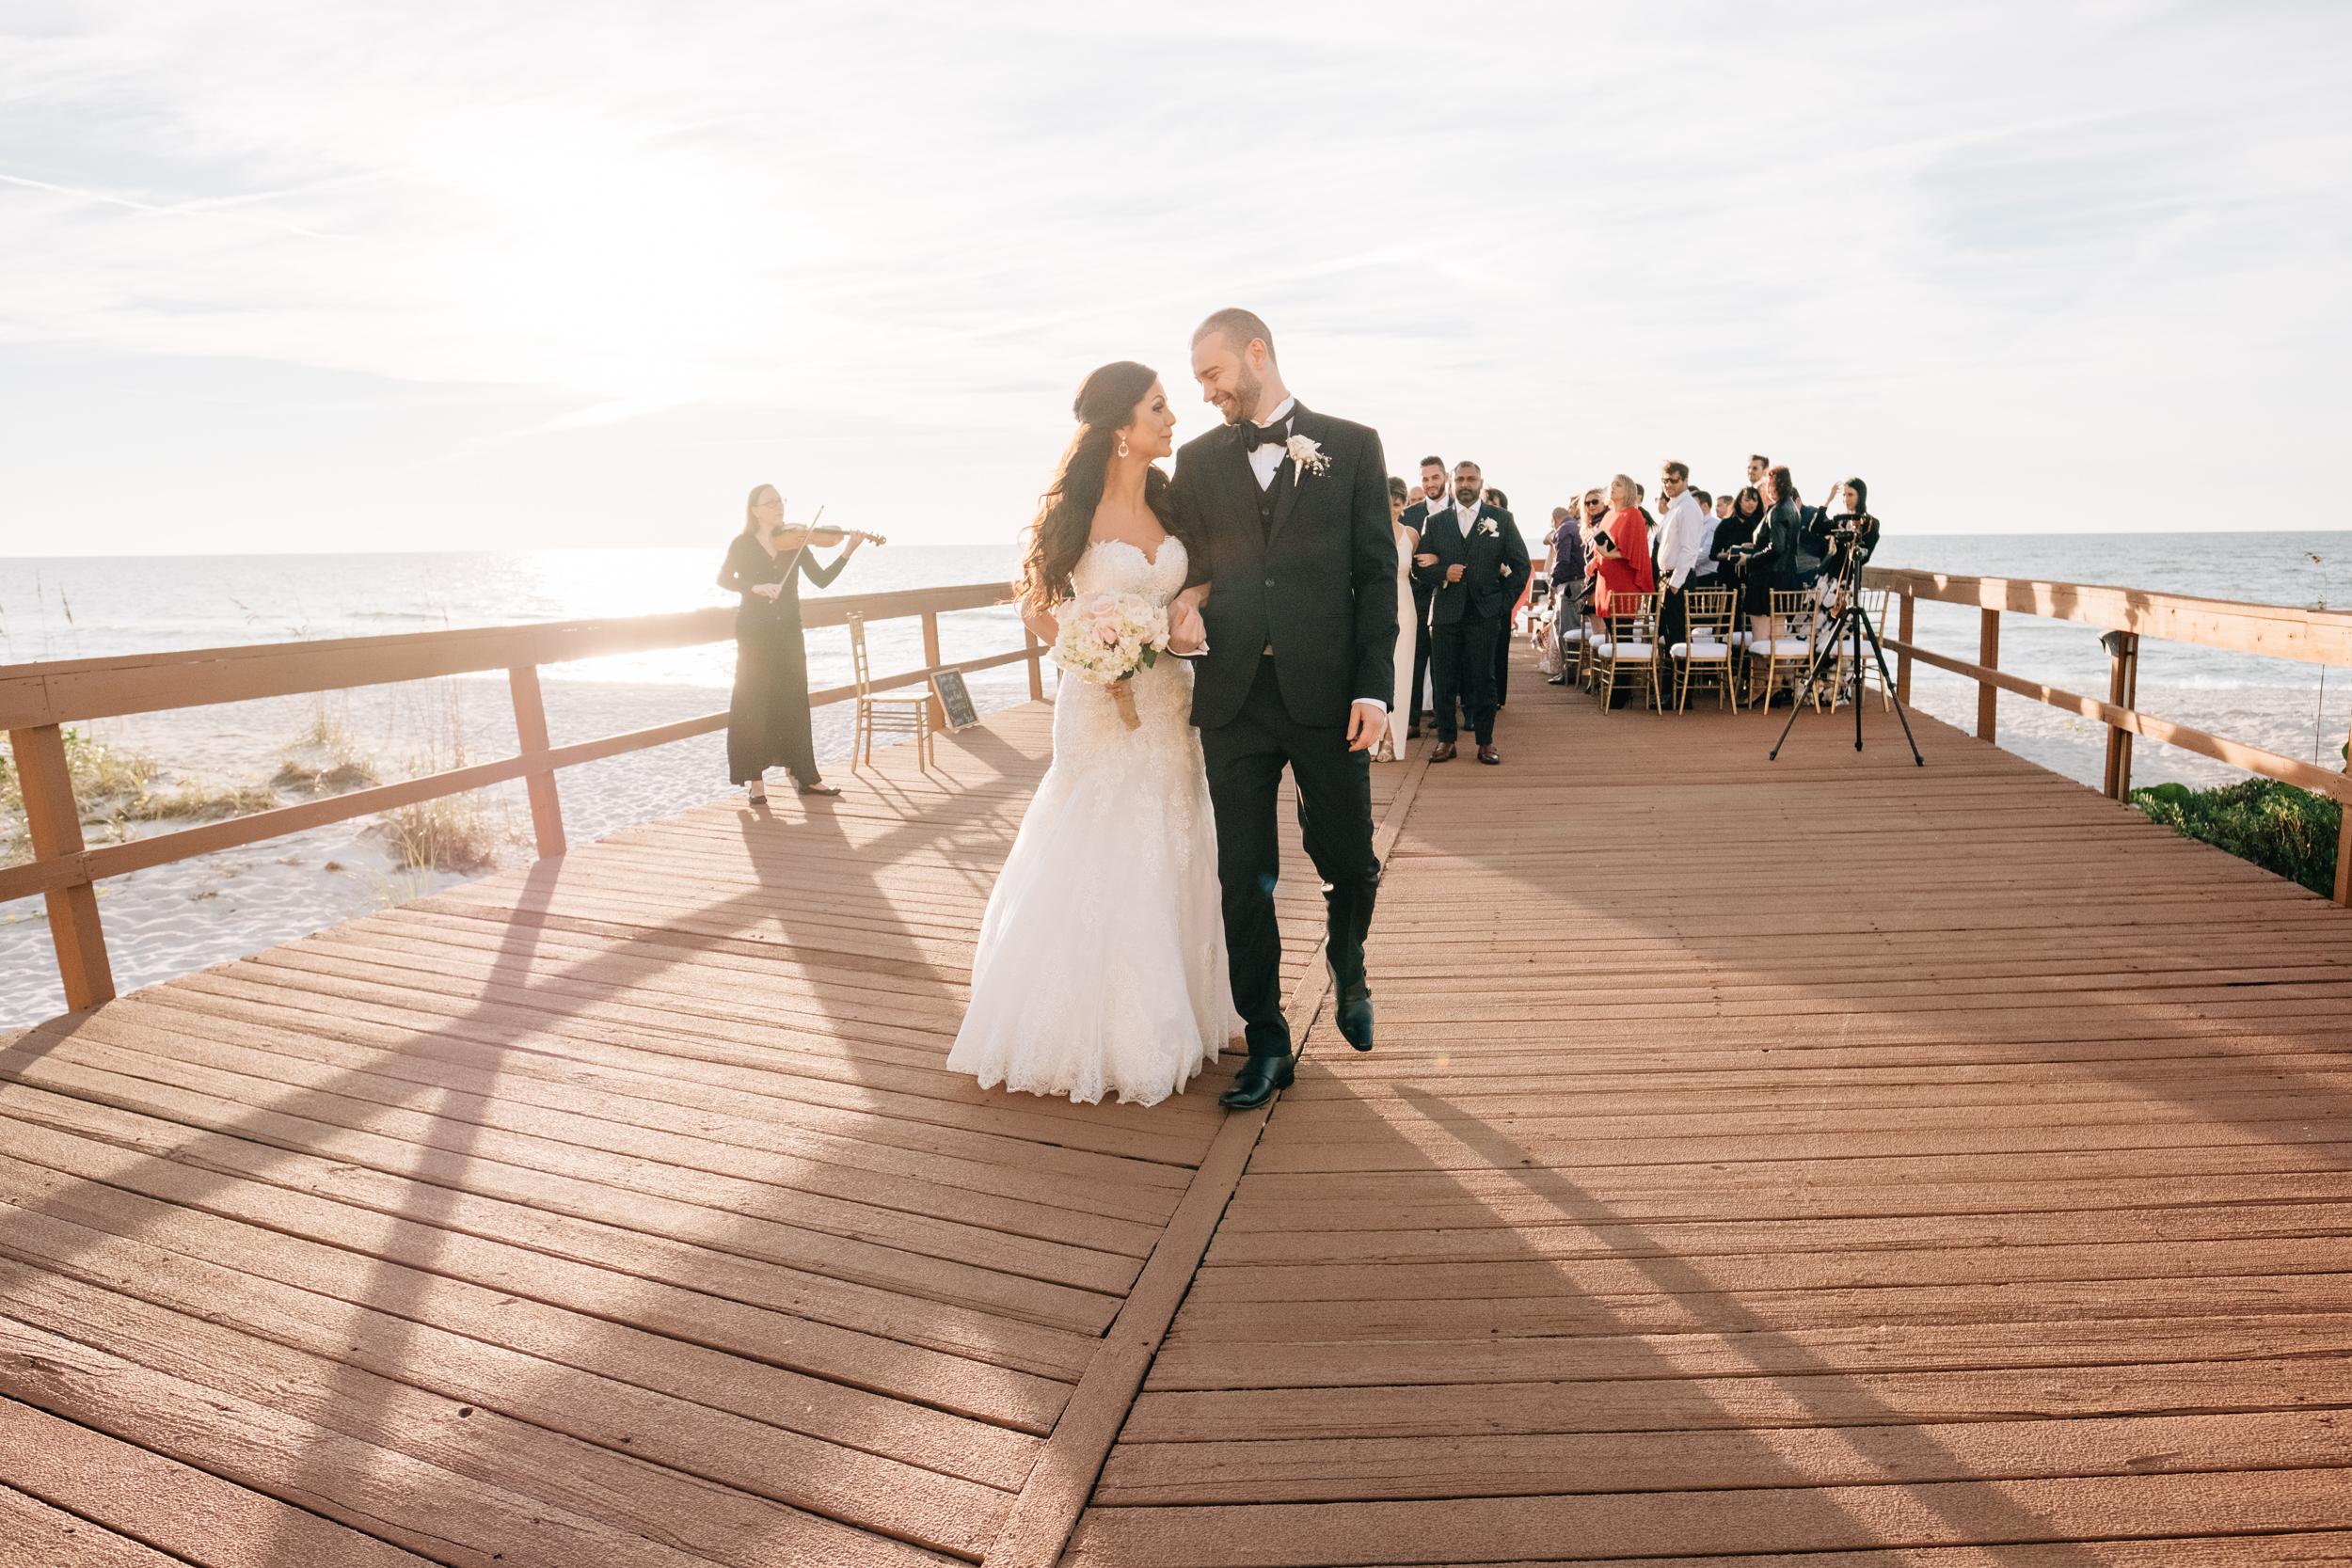 Amethyst Weddings - Georgi and Mariana 068.jpg